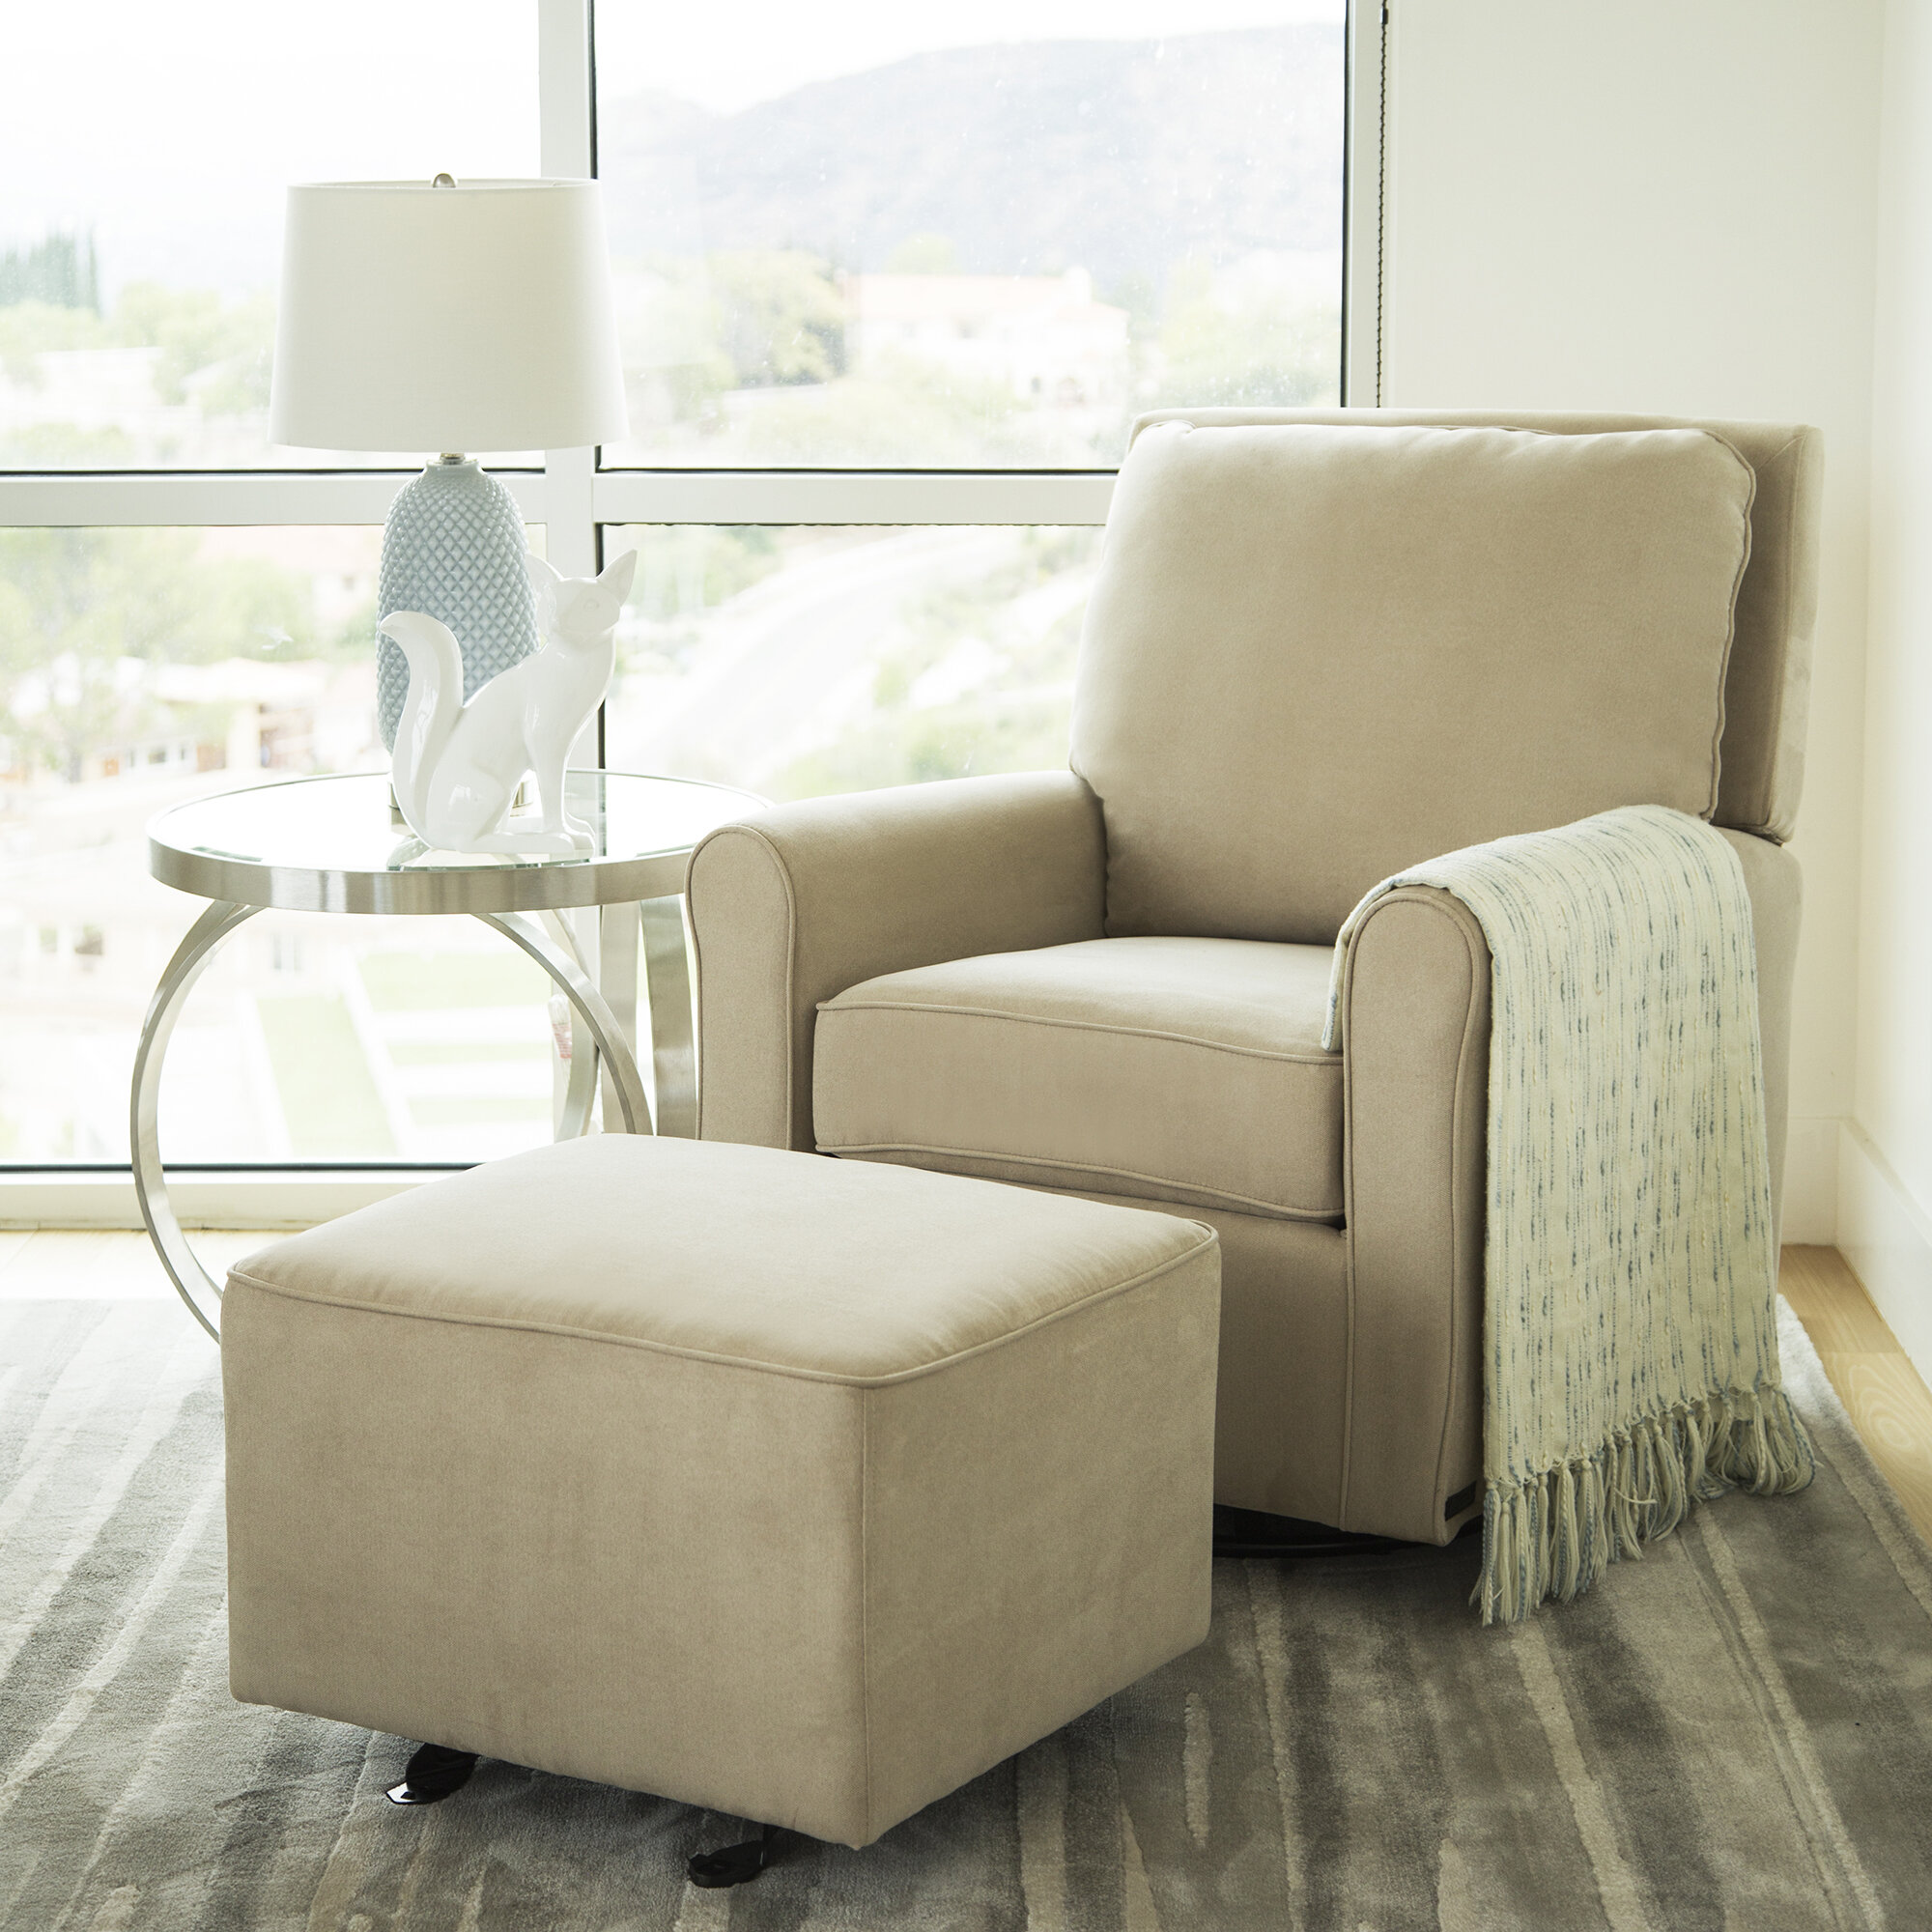 Pleasant Barnwell Swivel Glider And Ottoman Lamtechconsult Wood Chair Design Ideas Lamtechconsultcom